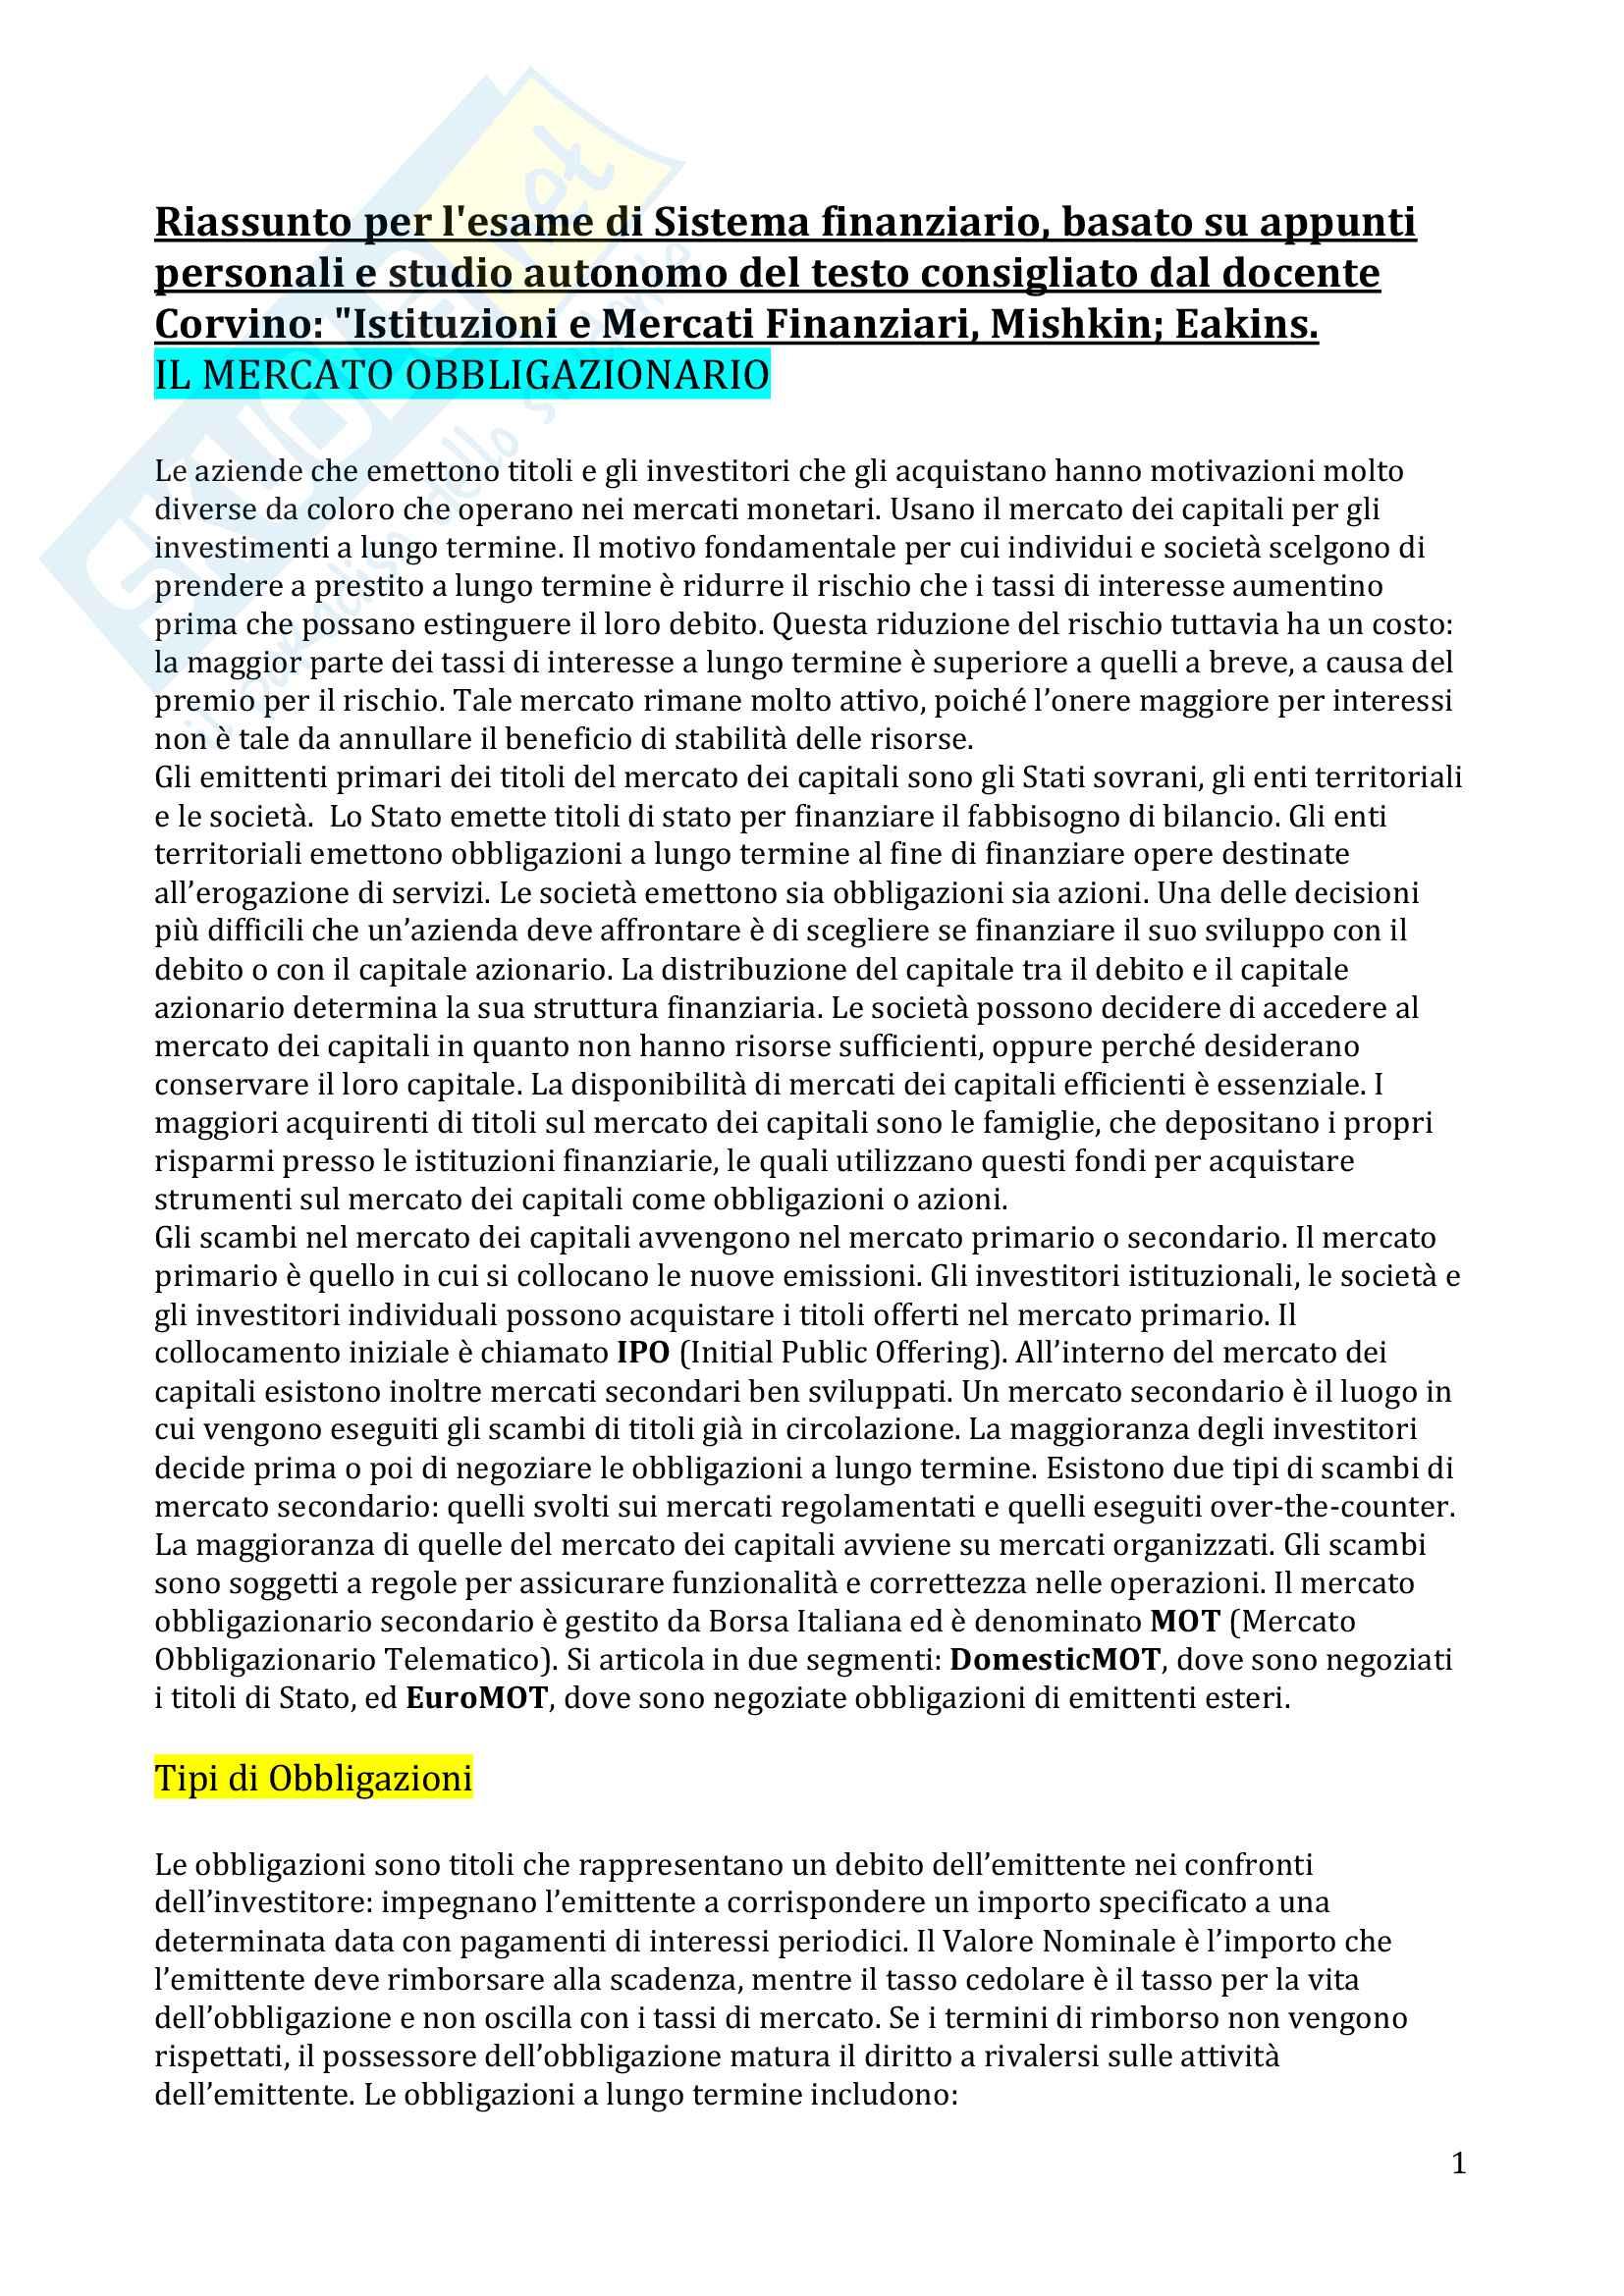 appunto G. Corvino Sistema finanziario